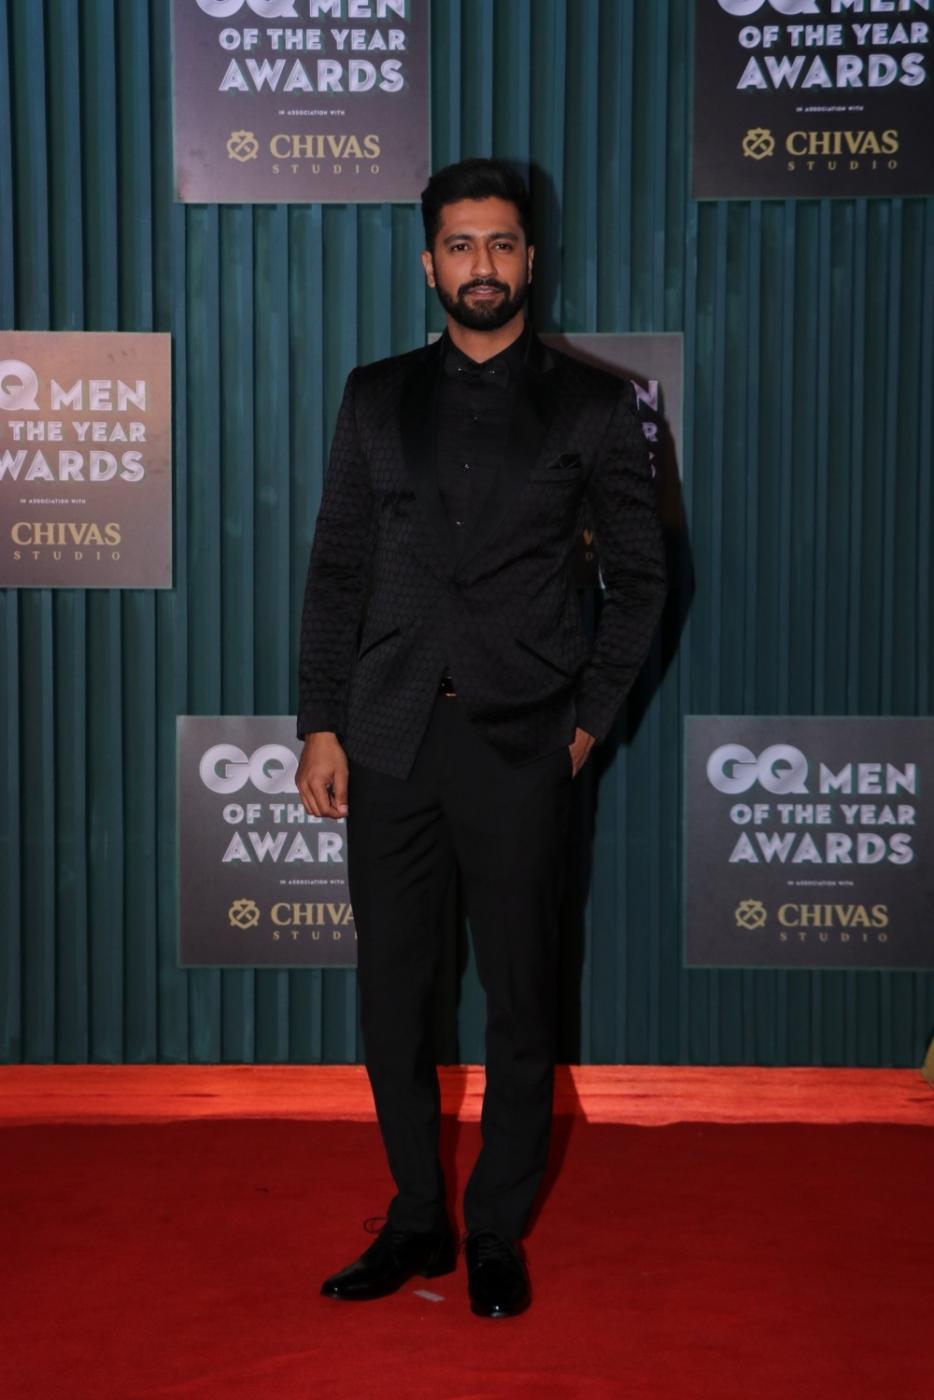 "Mumbai: Actor Vicky Kaushal at the ""GQ Men of the Year Awards 2018"" in Mumbai on Sept 27, 2018. (Photo: IANS) by ."